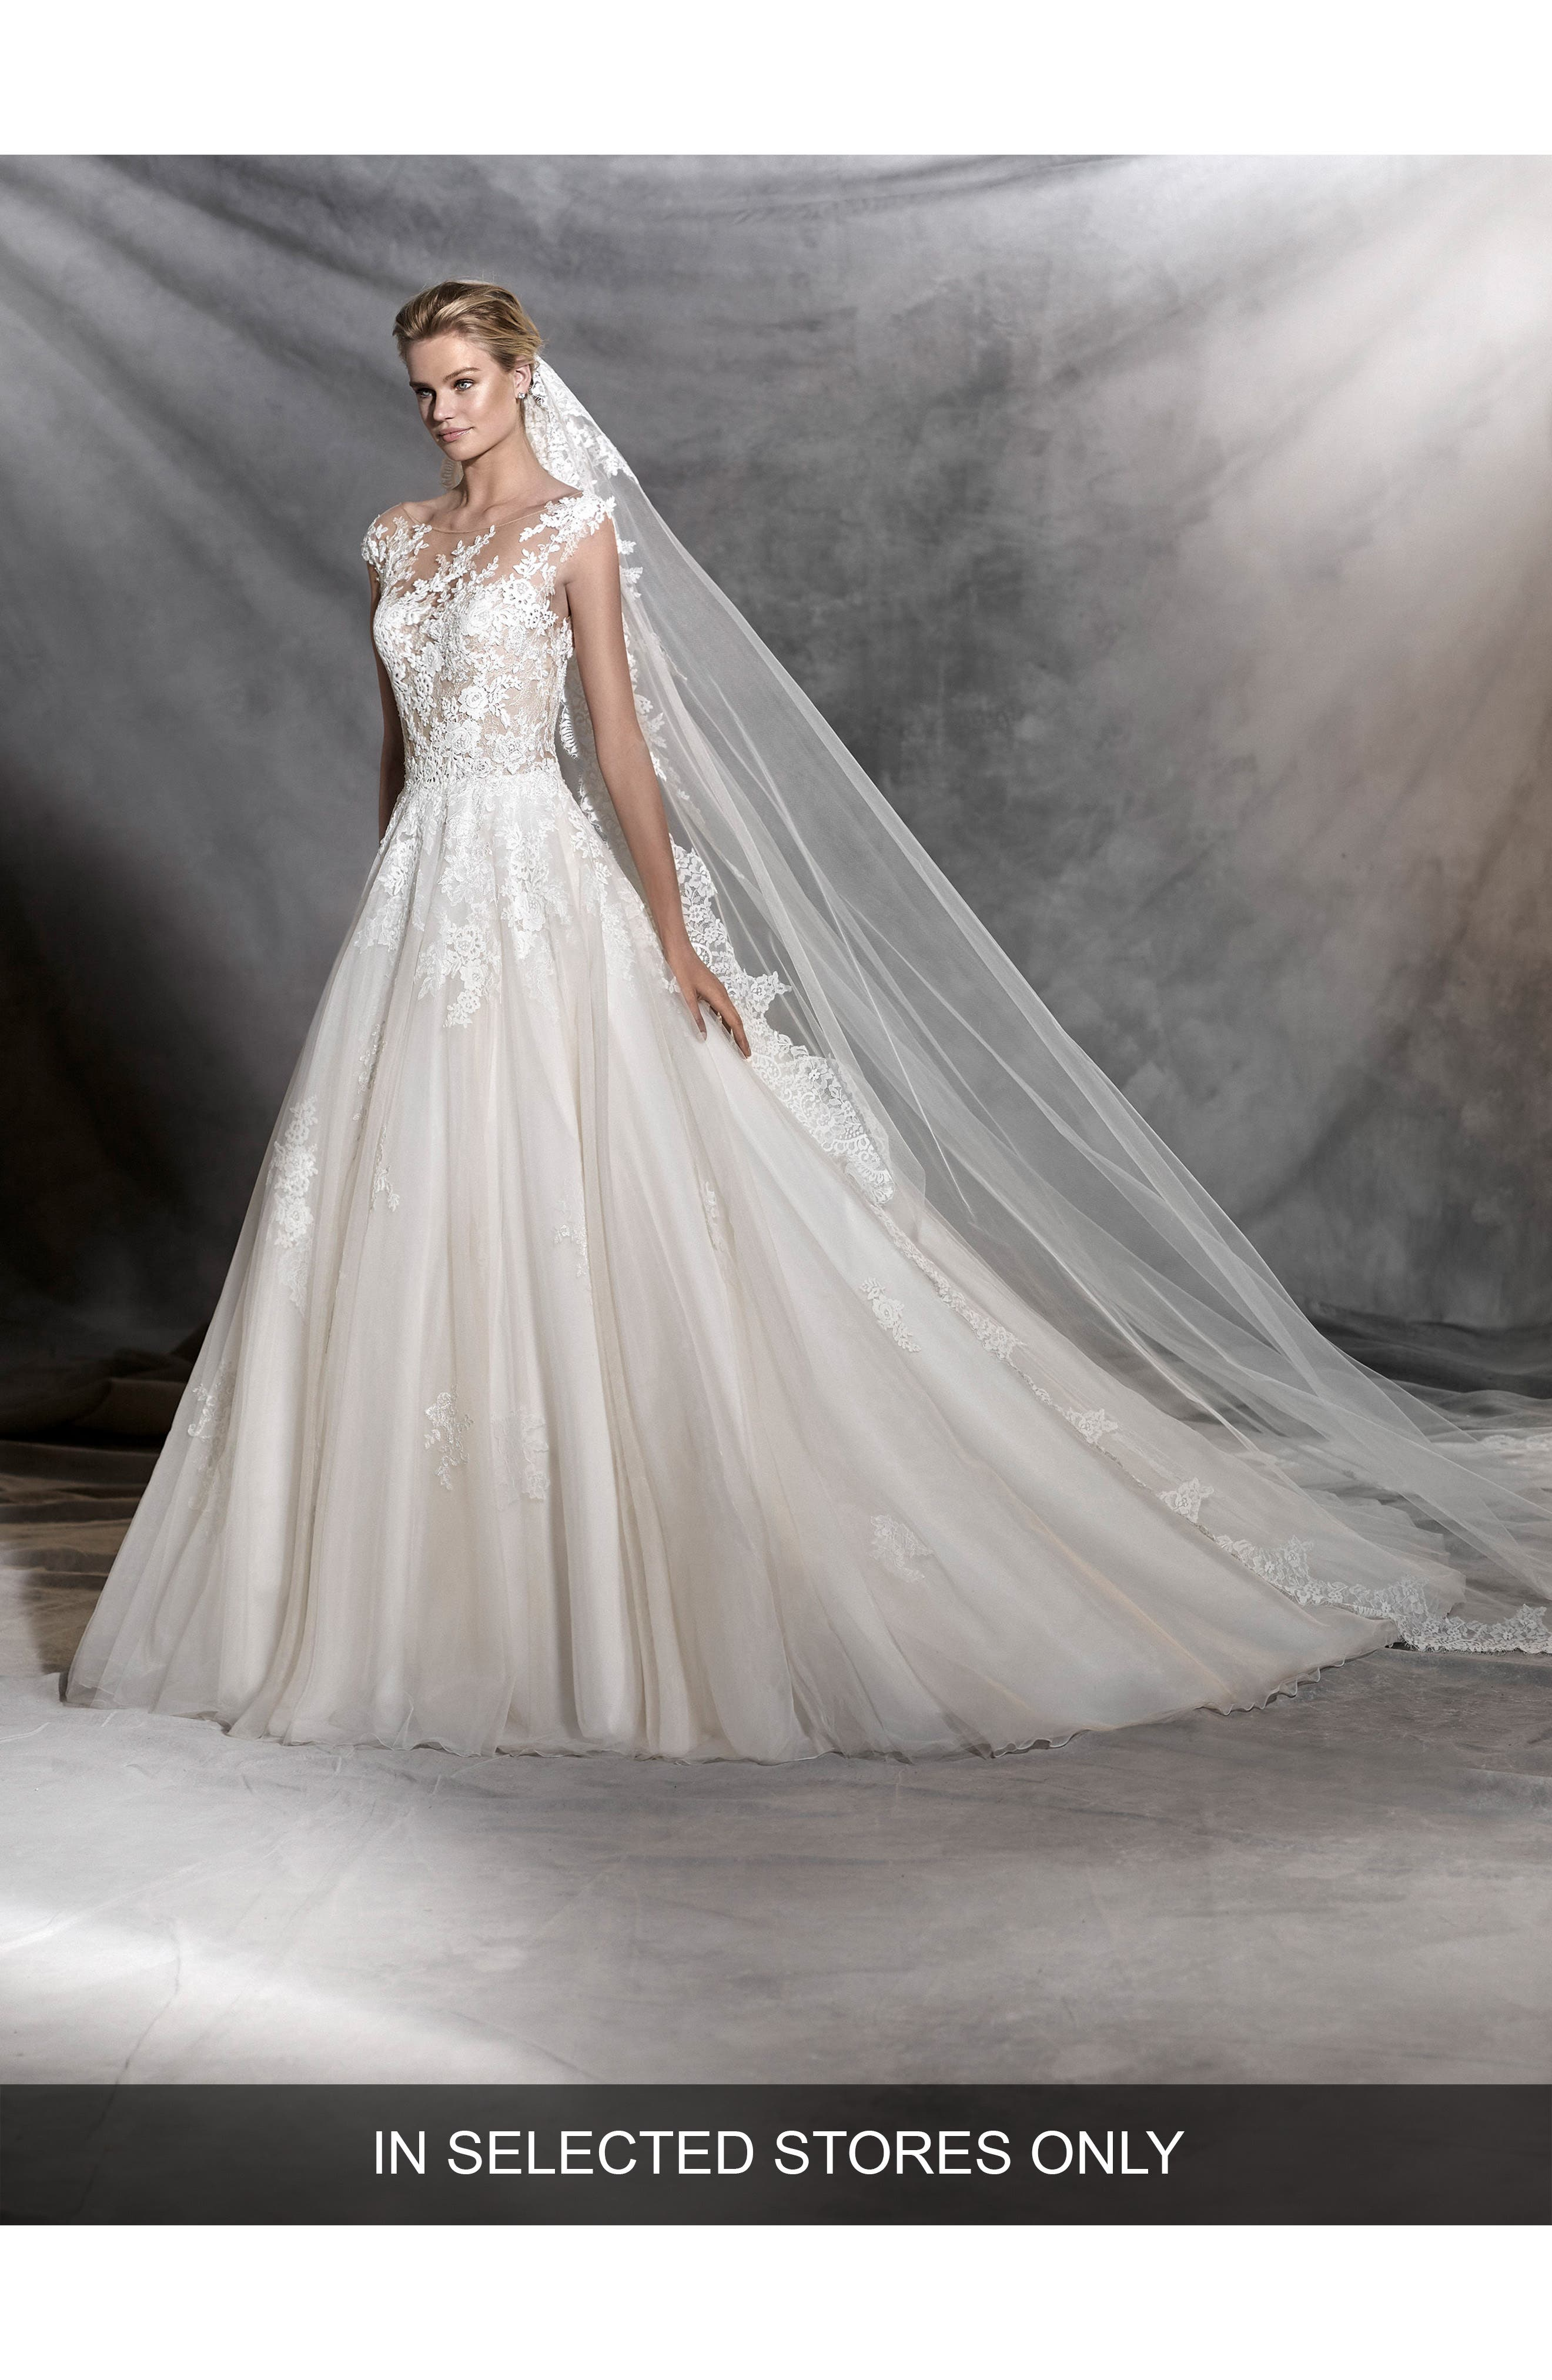 Ofelia Illusion Lace & Tulle Ballgown,                         Main,                         color, Off White